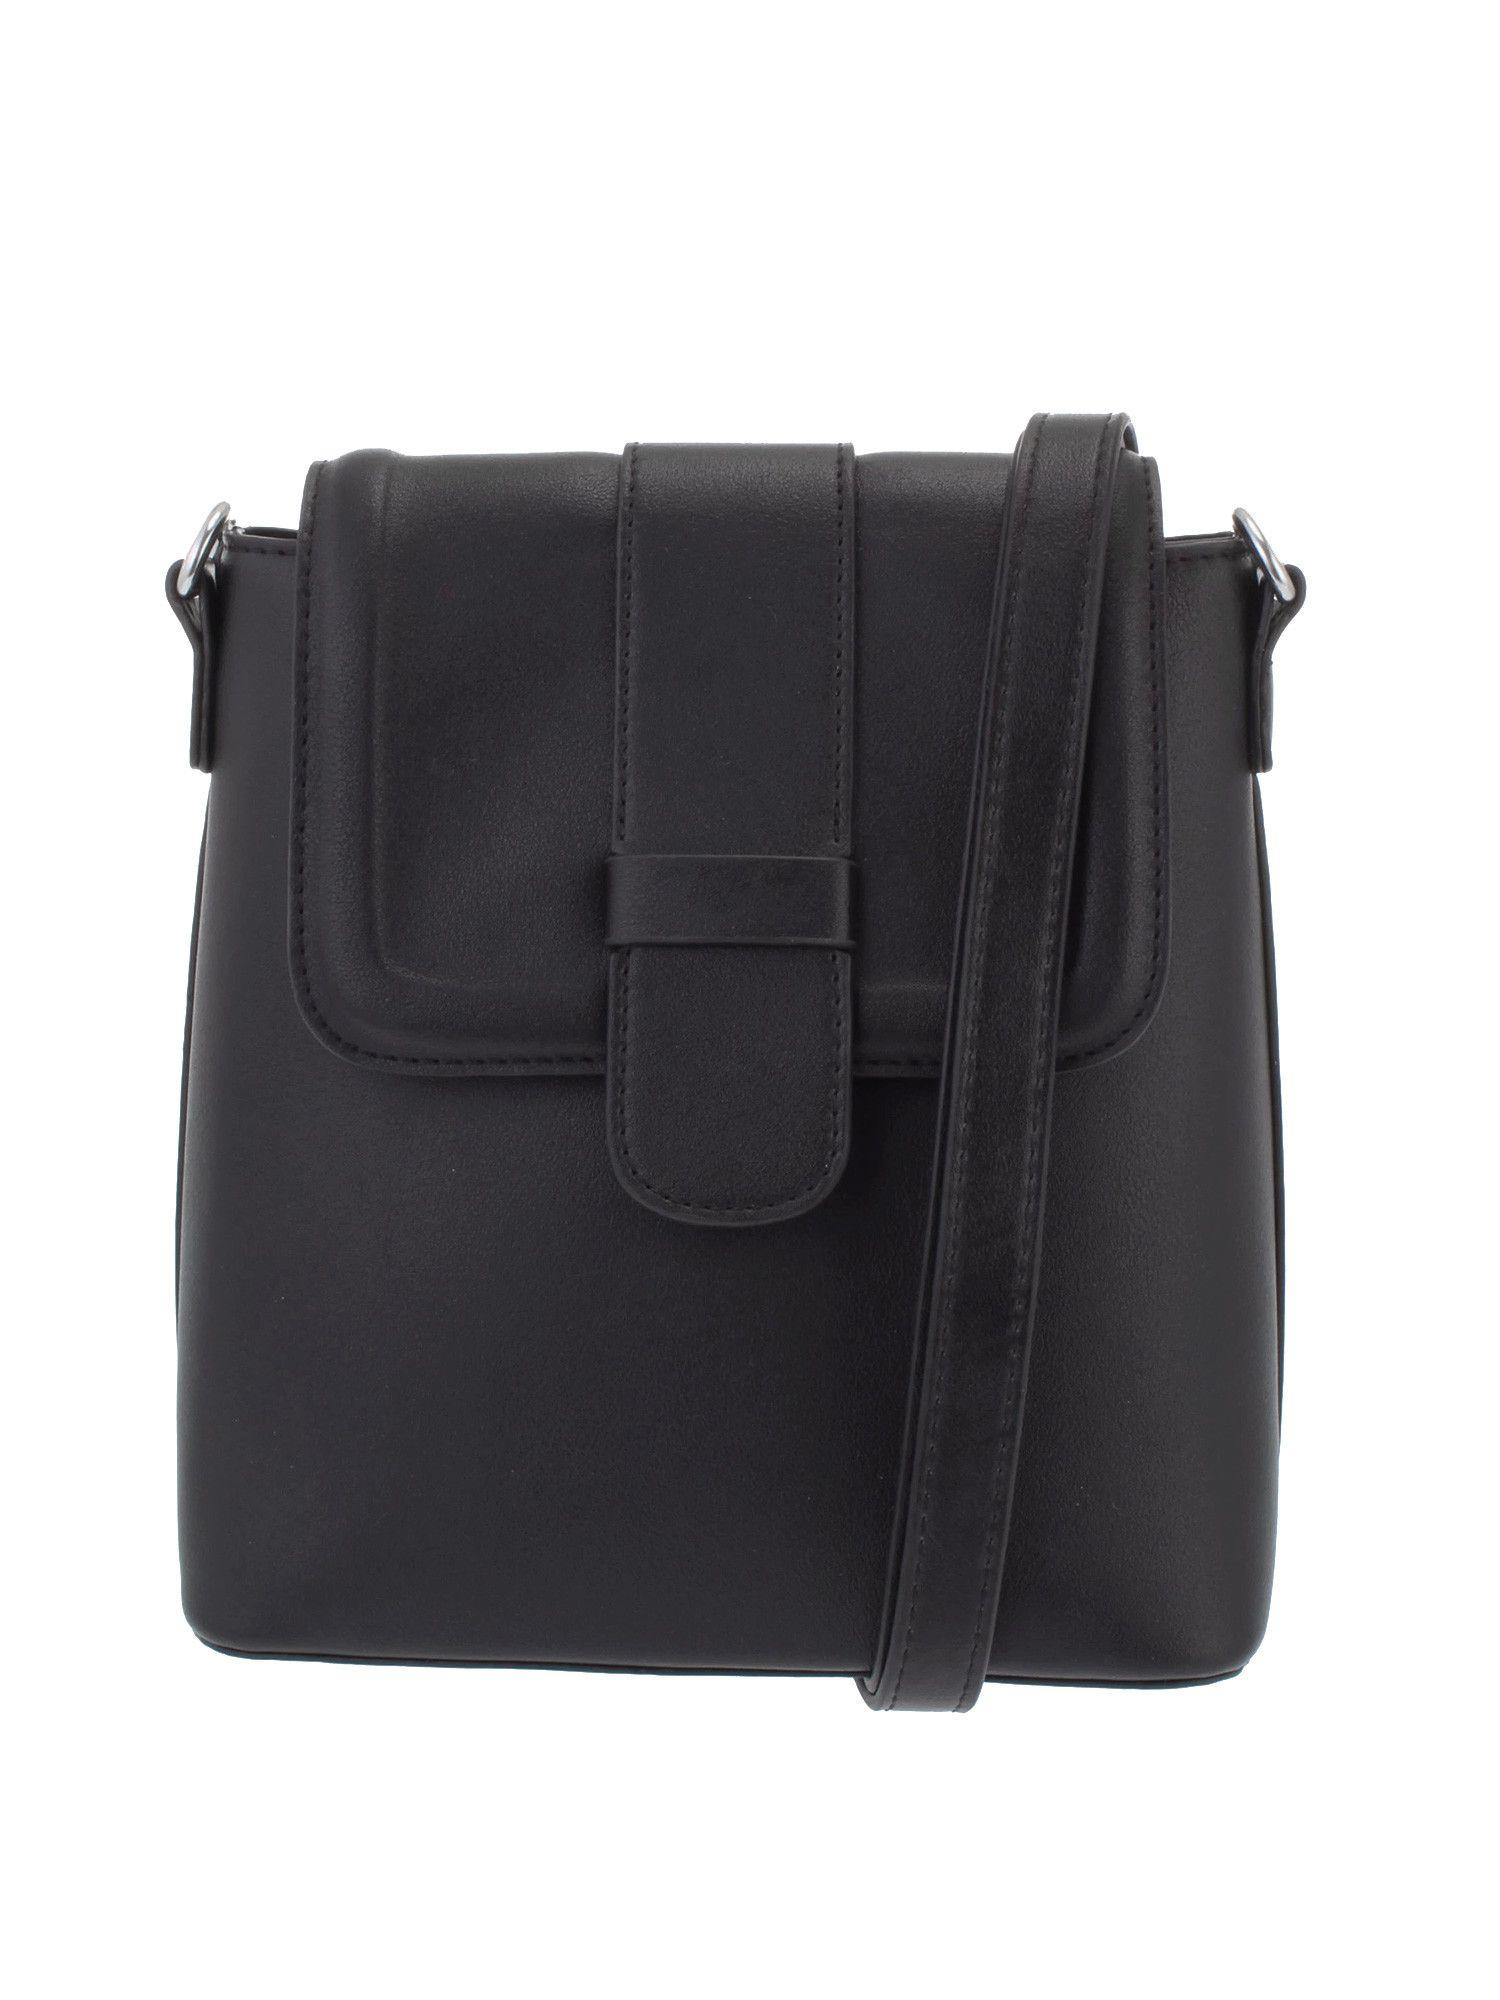 3WAY Torape over's bag